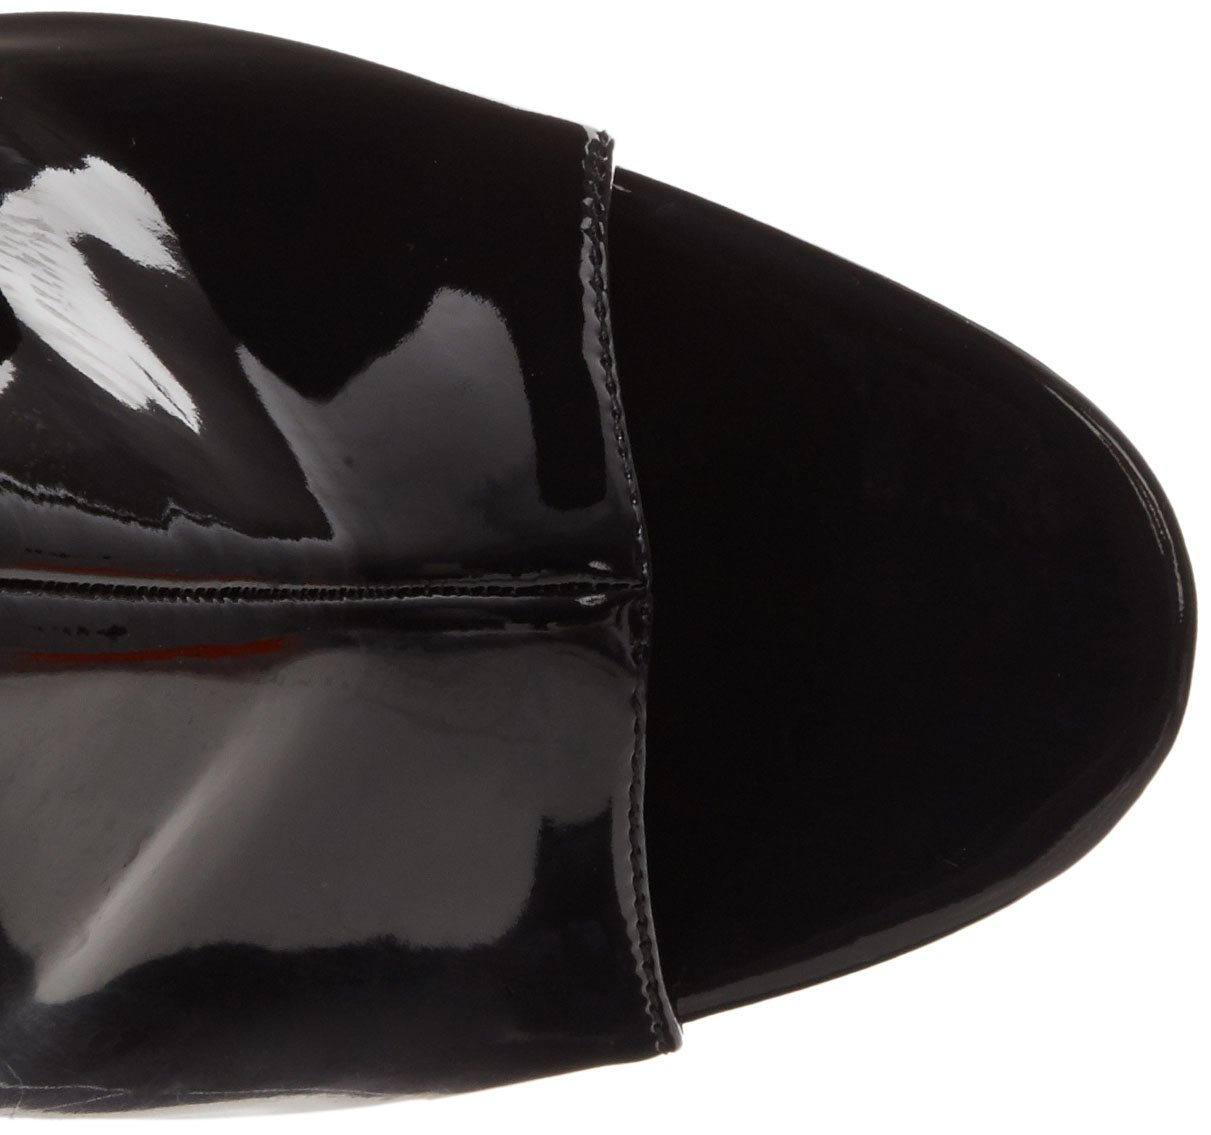 Pleaser Women's Illusion-1018 Boot B00B472VOQ 7 B(M) US|Black Patent